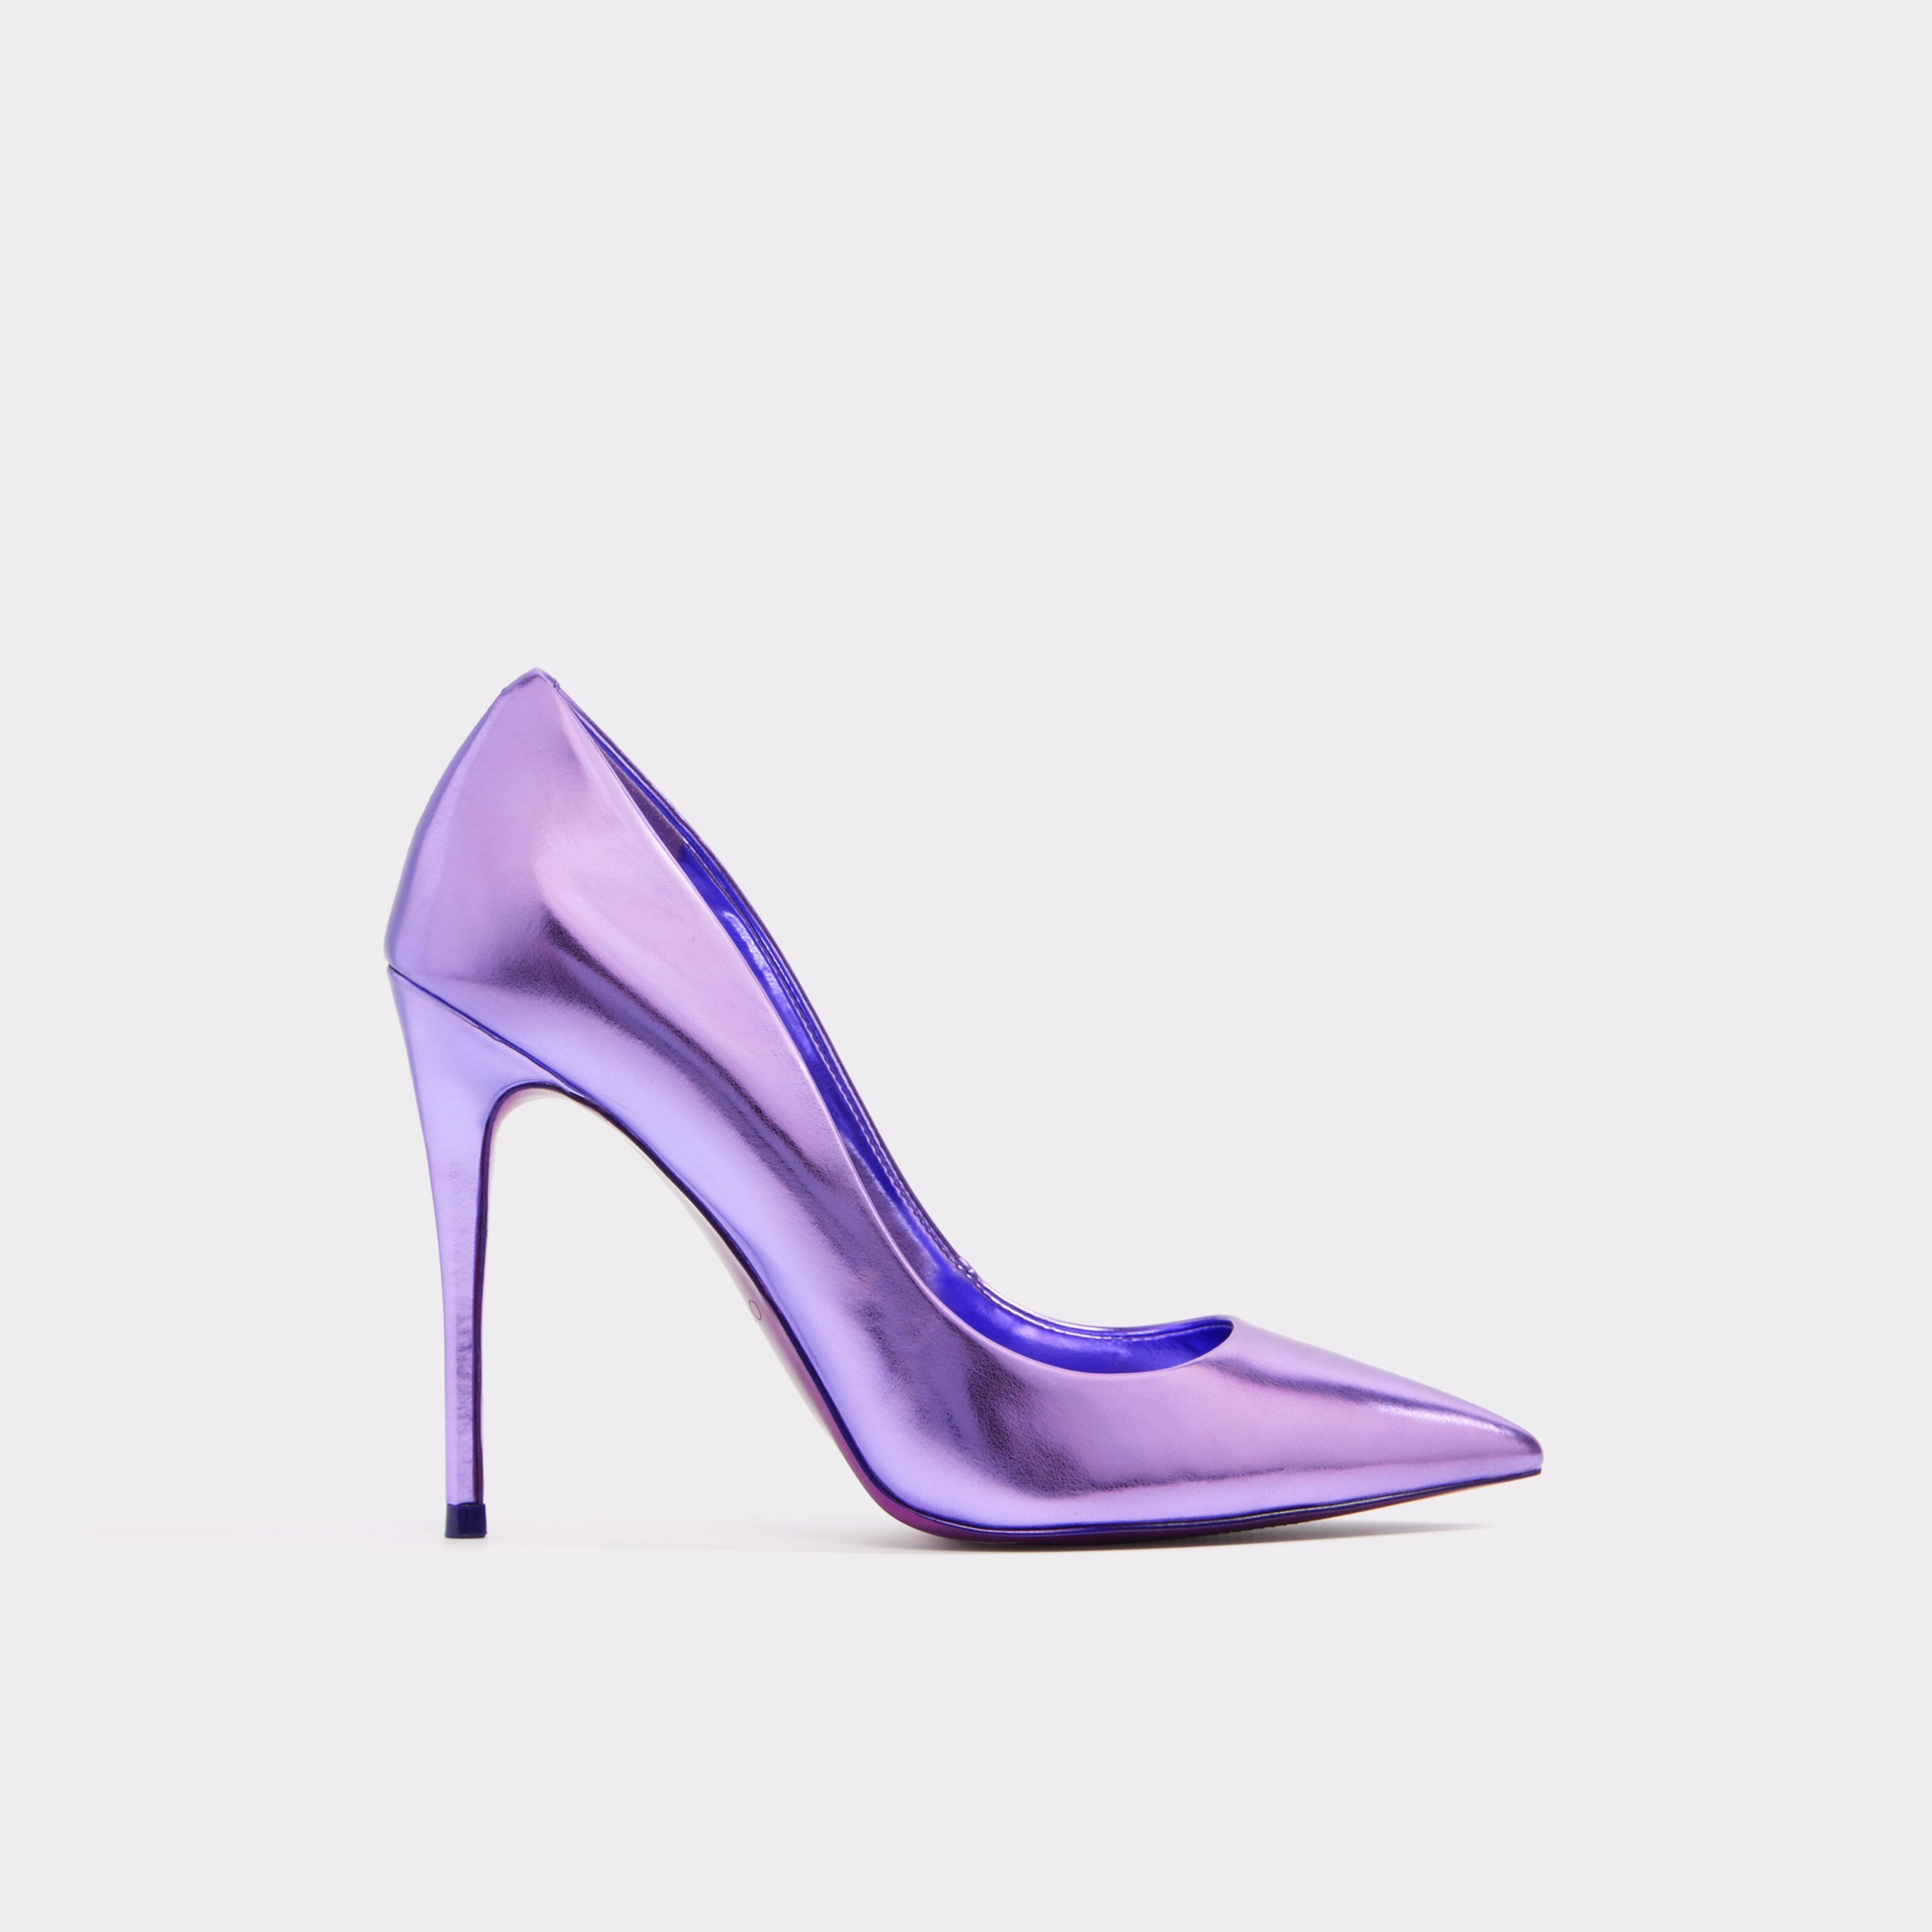 da012b999242 Lyst - ALDO Stessy  in Purple